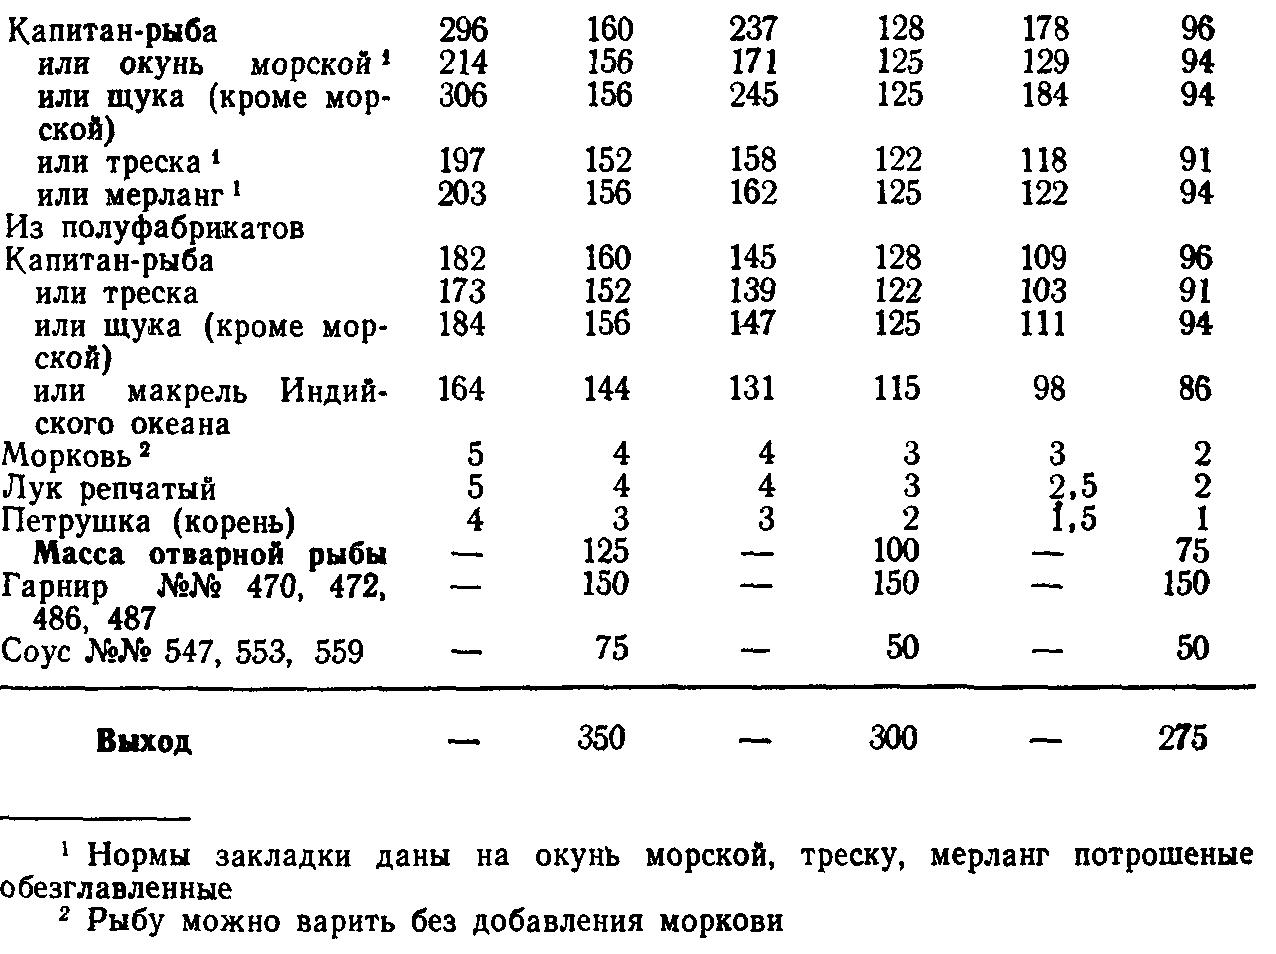 Рыба филе отварная (ТТК5652)